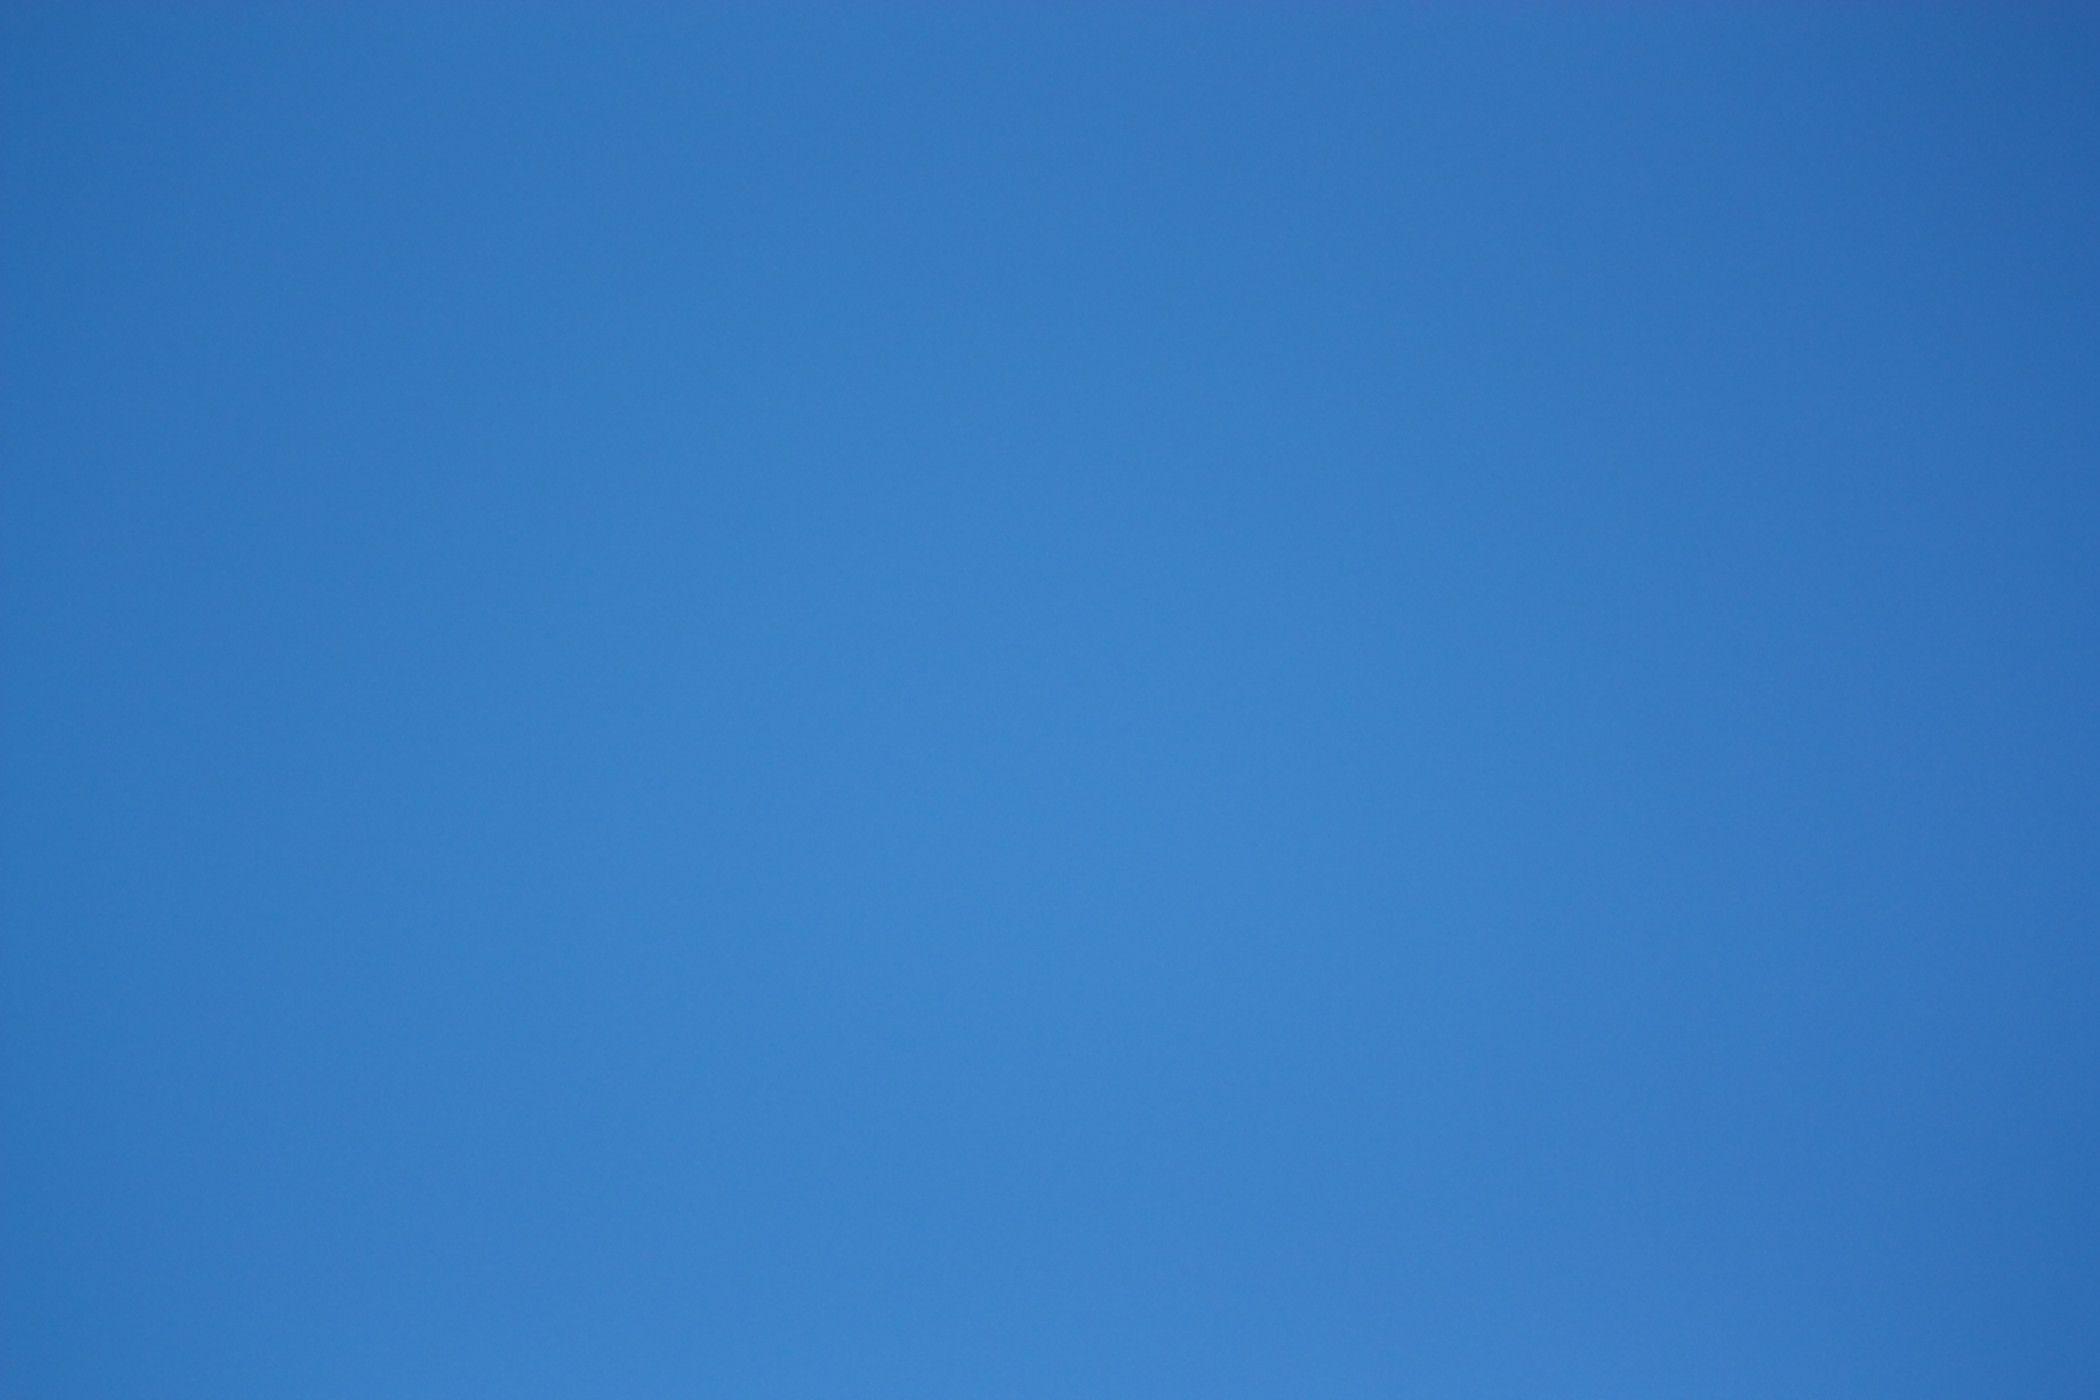 plain blue background wallpaper  u00b7 u2460 wallpapertag